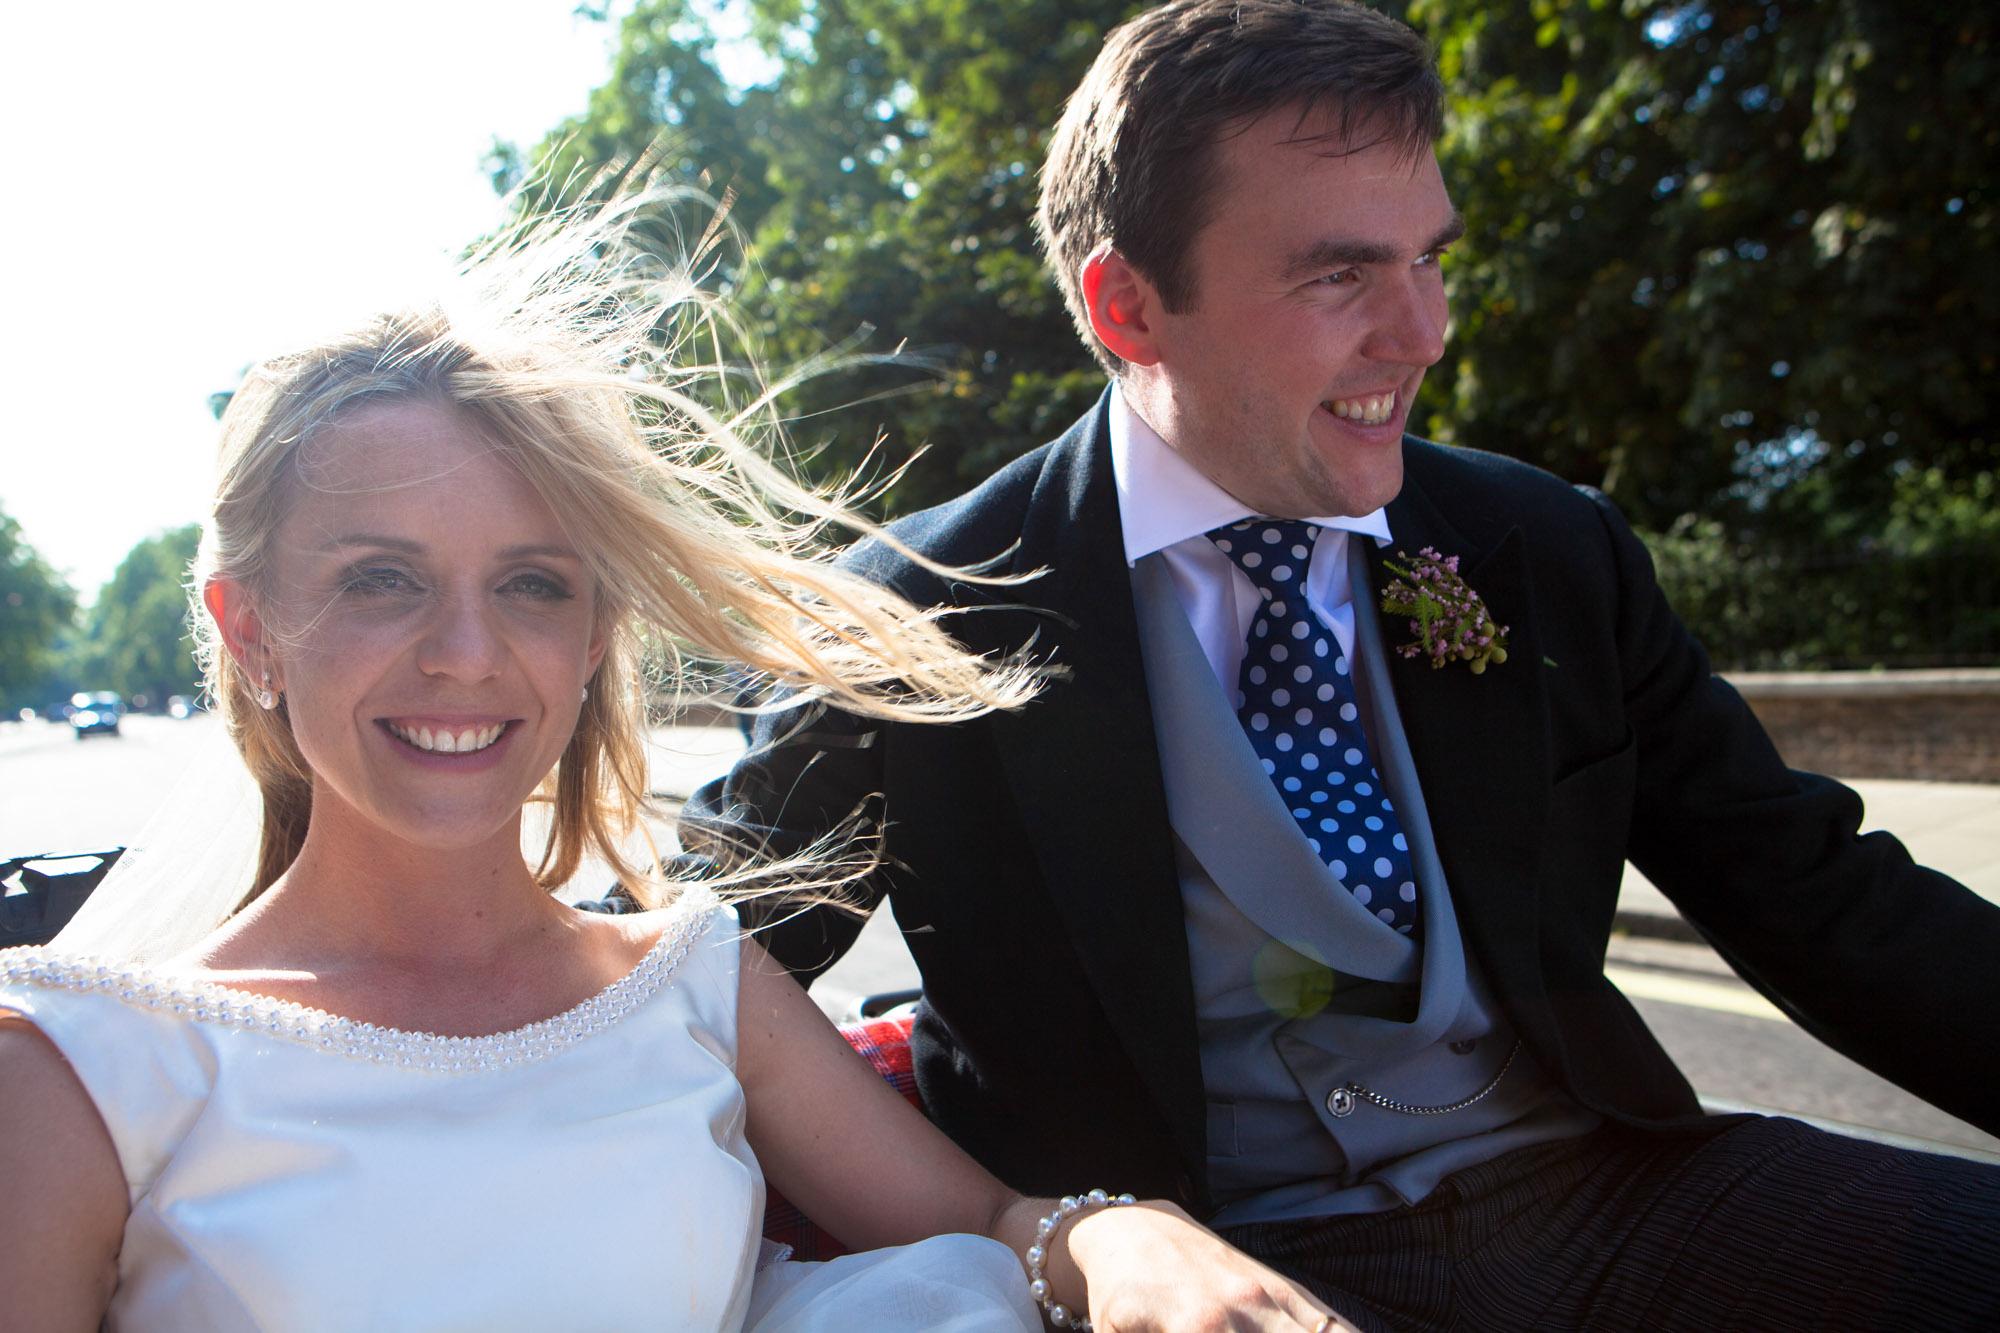 weddings-couples-love-photographer-oxford-london-jonathan-self-photography-95.jpg